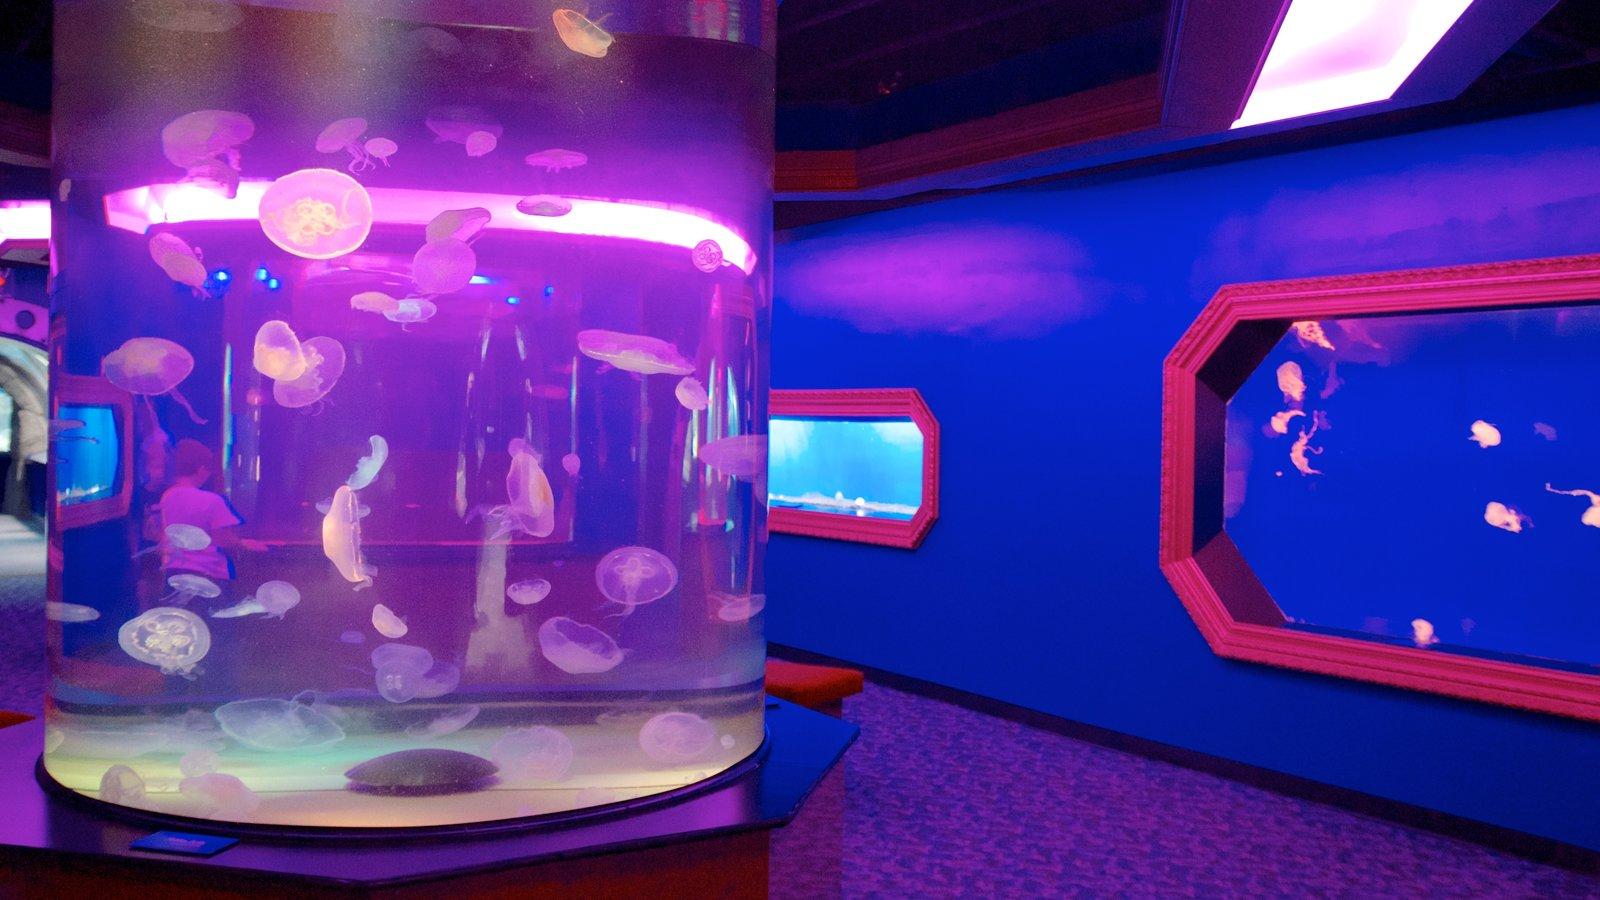 Newport Aquarium caracterizando vistas internas e vida marinha